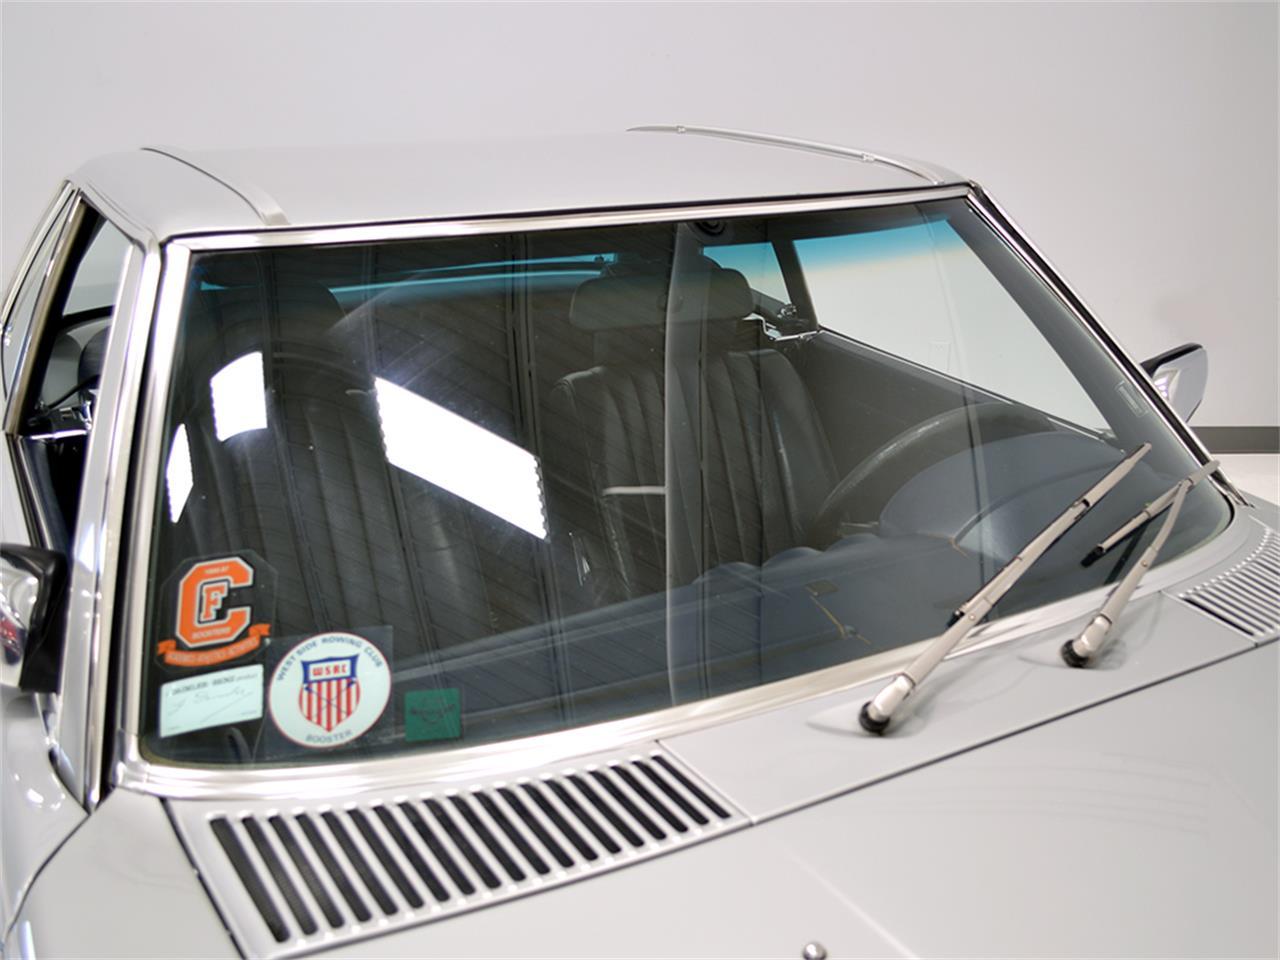 Large Picture of '84 Mercedes-Benz 380SL - $17,900.00 Offered by Harwood Motors, LTD. - KA2F